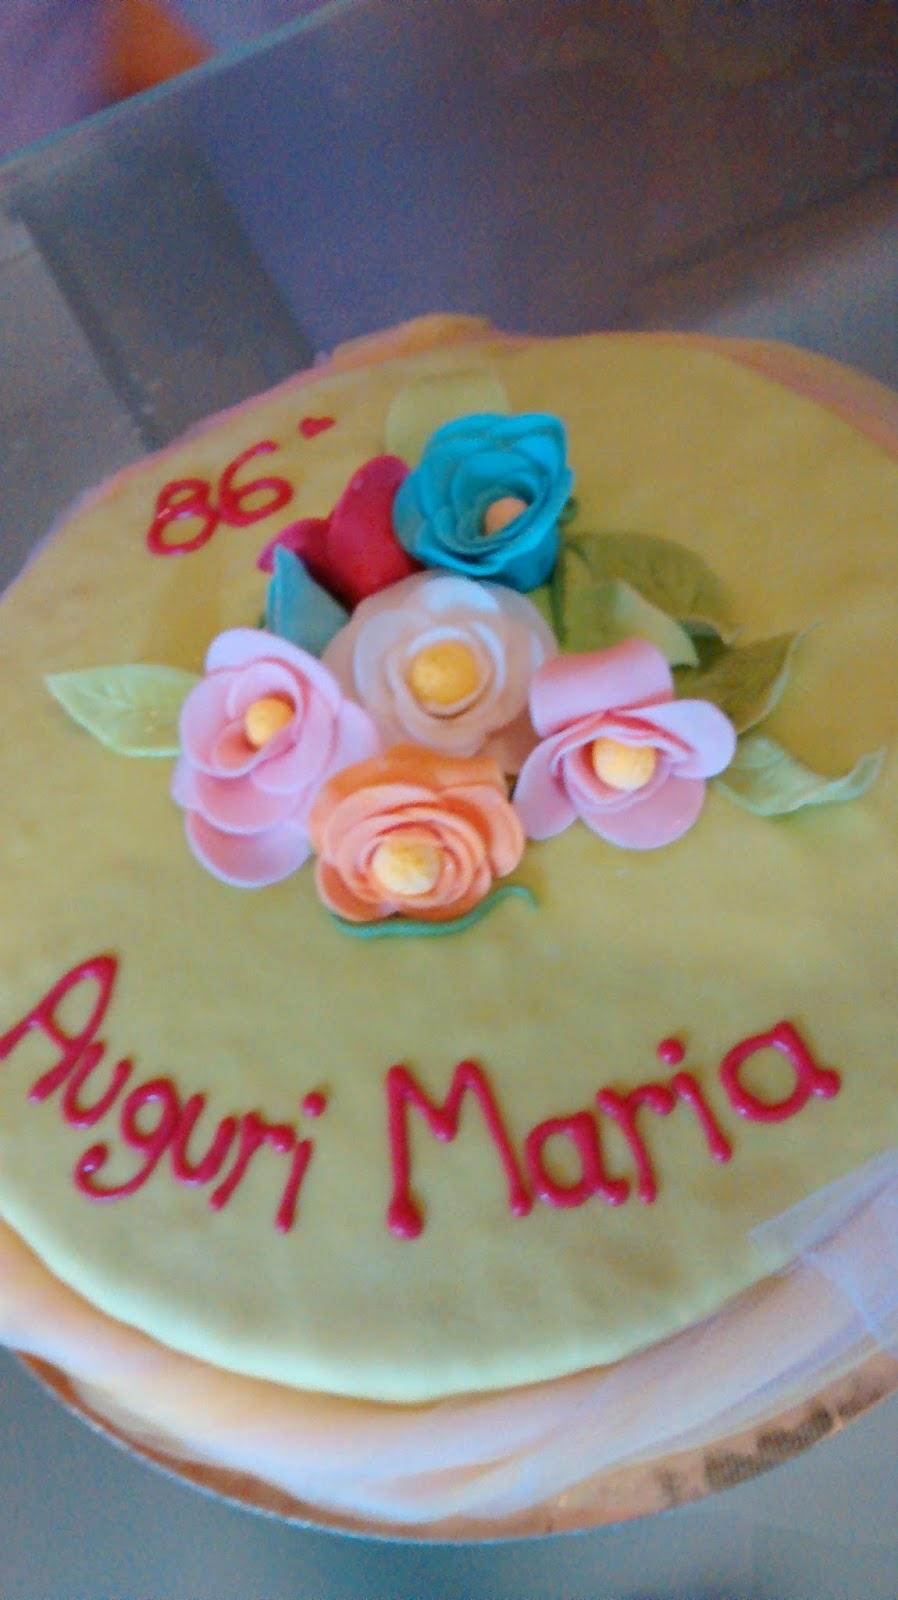 MagicaFlo Cake Design Cuneo: Auguri Maria!